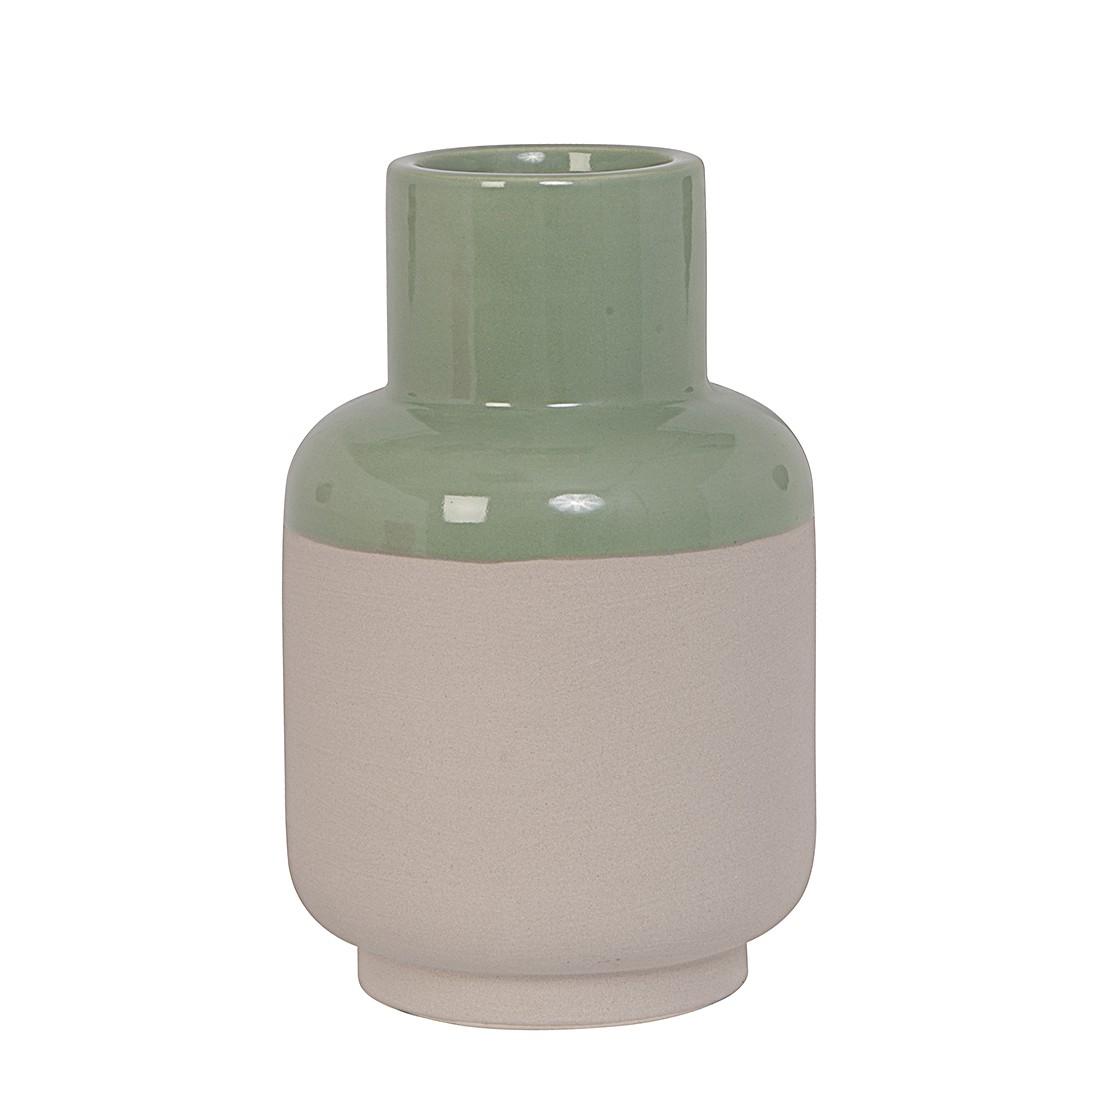 Vase Native – Lehm/Jadegrün, Present Time bestellen